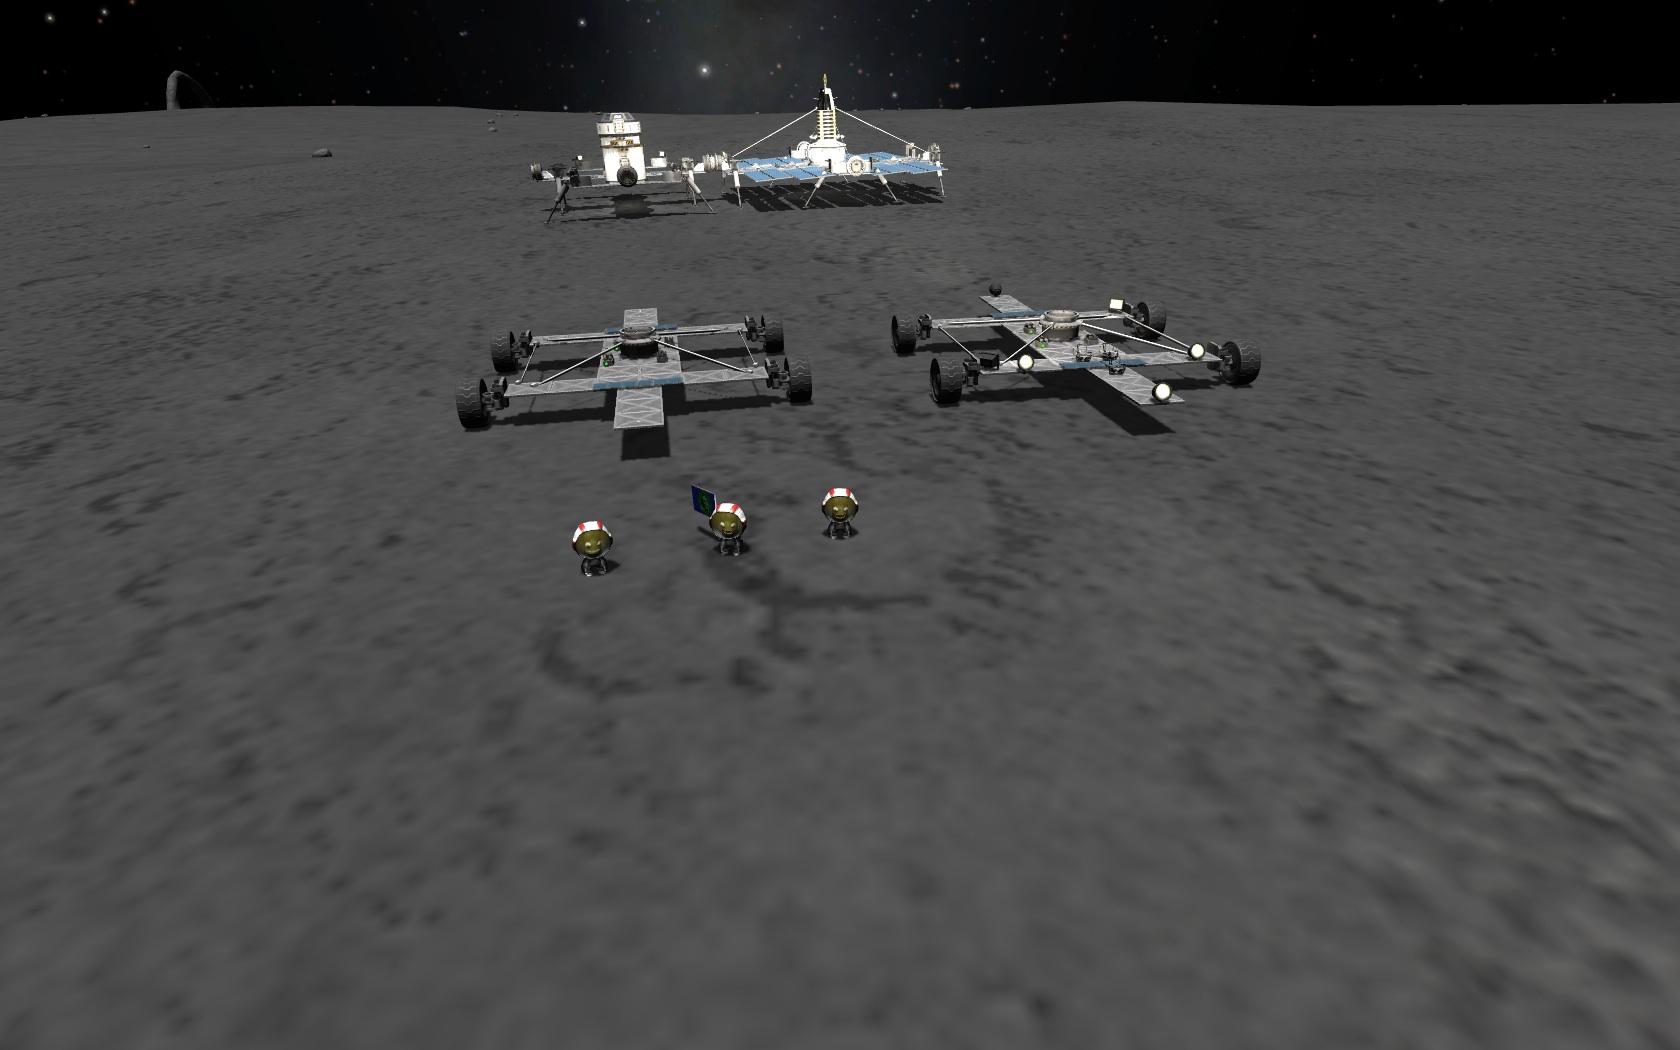 kerbal space program duna base - photo #39